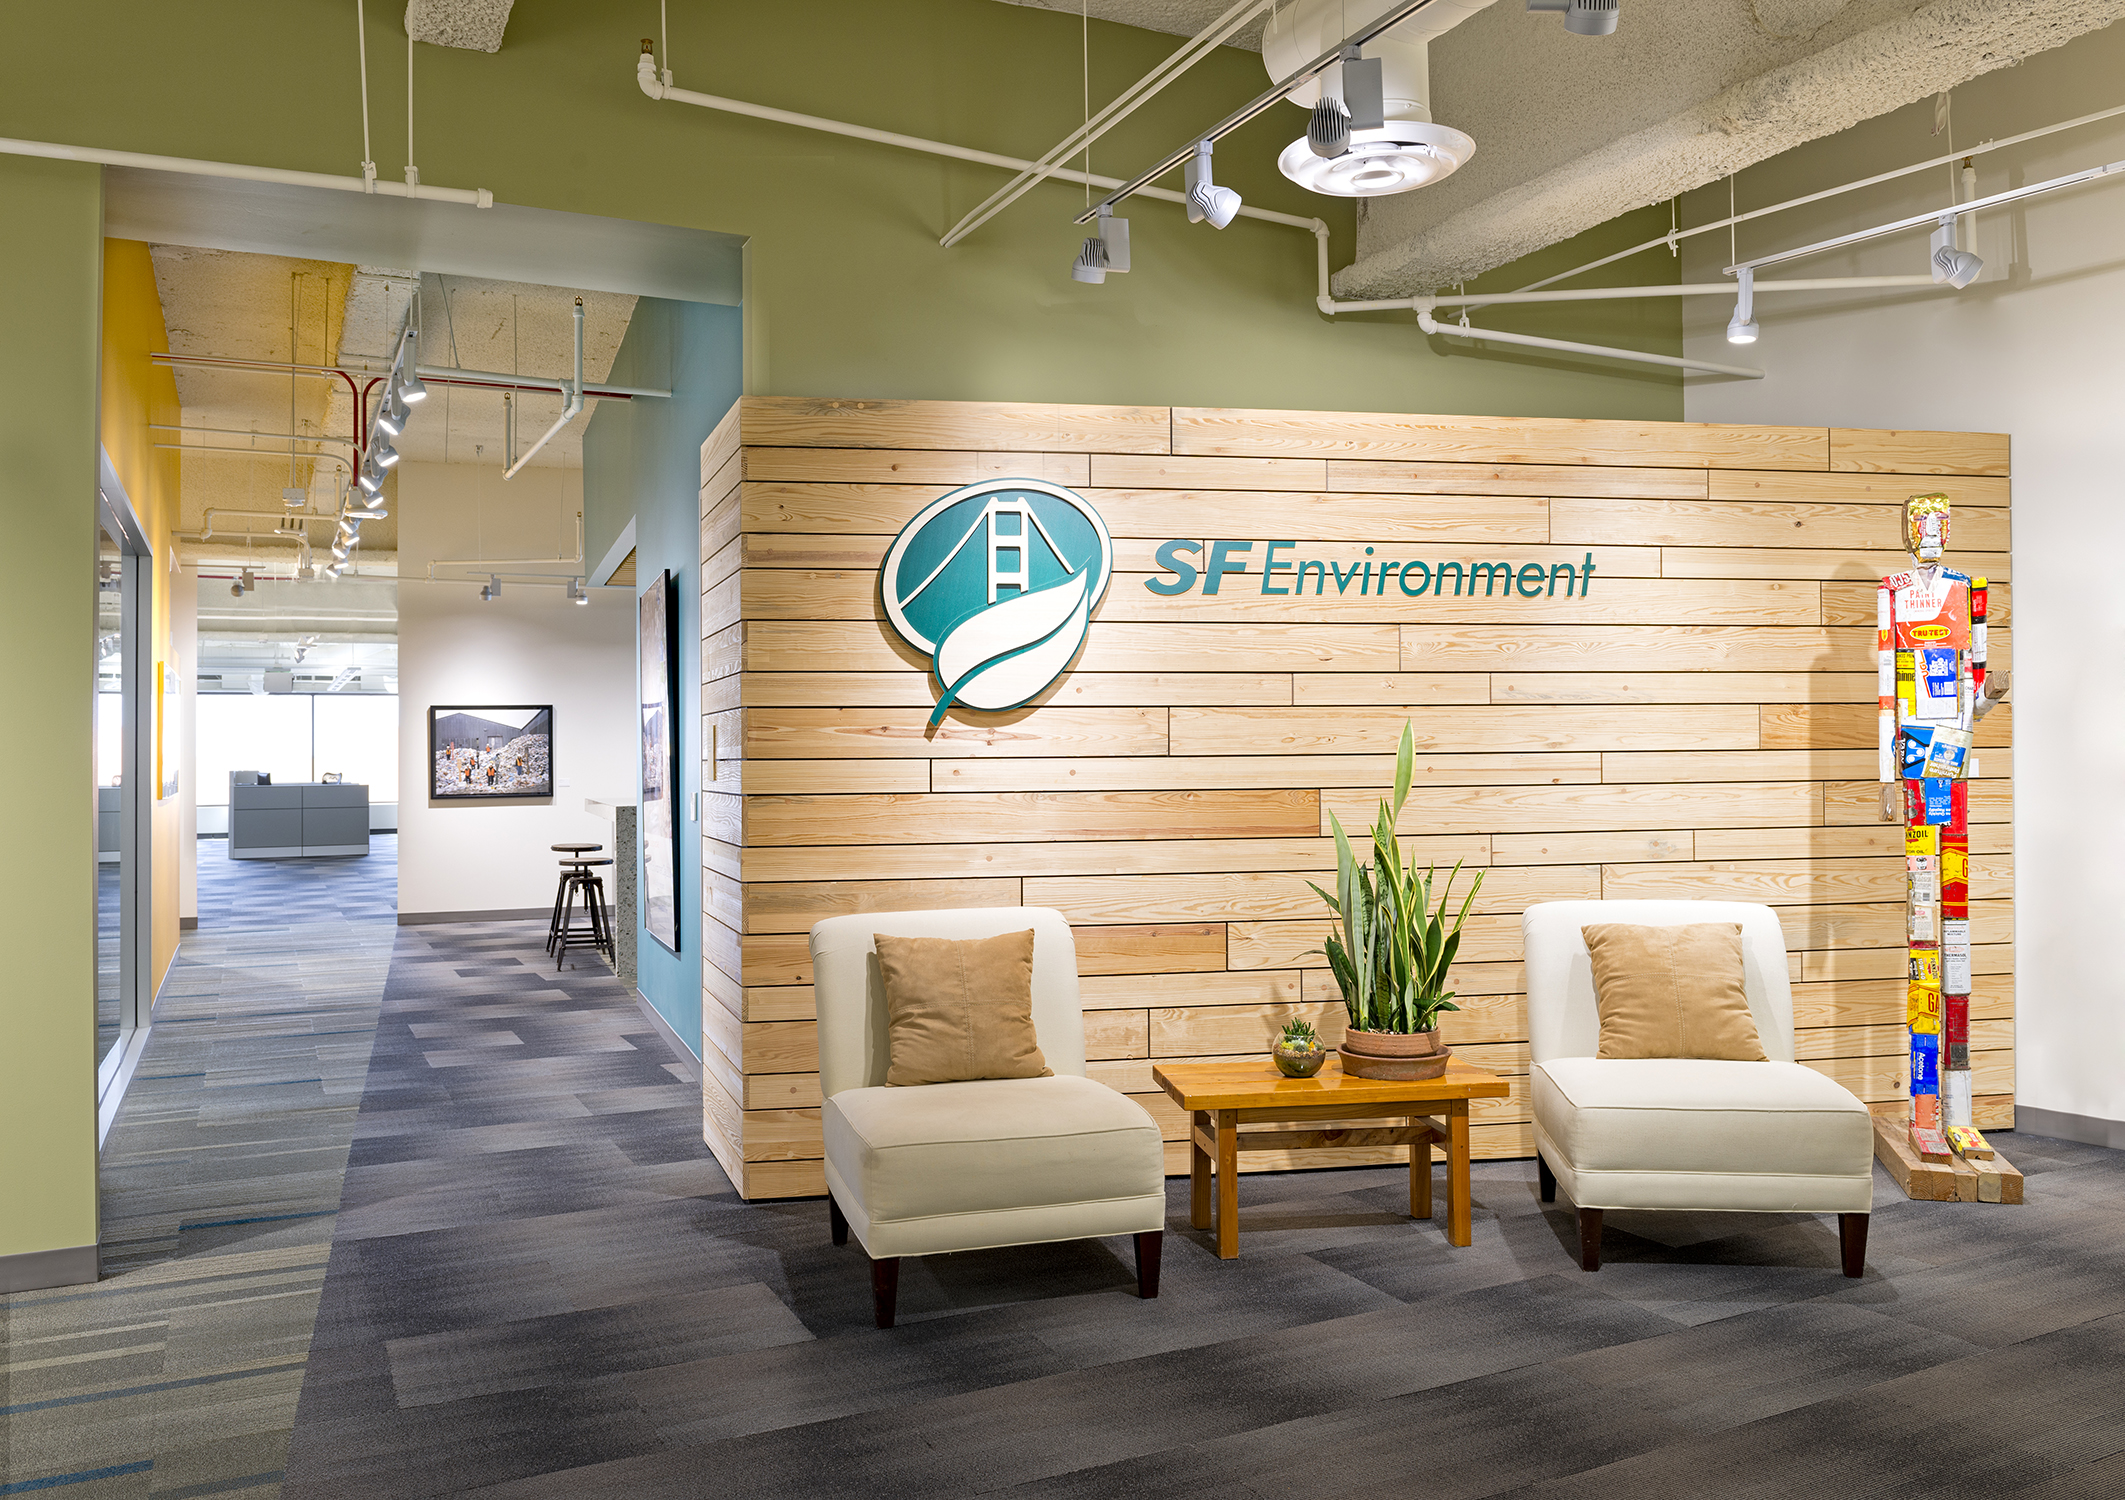 SF Environment